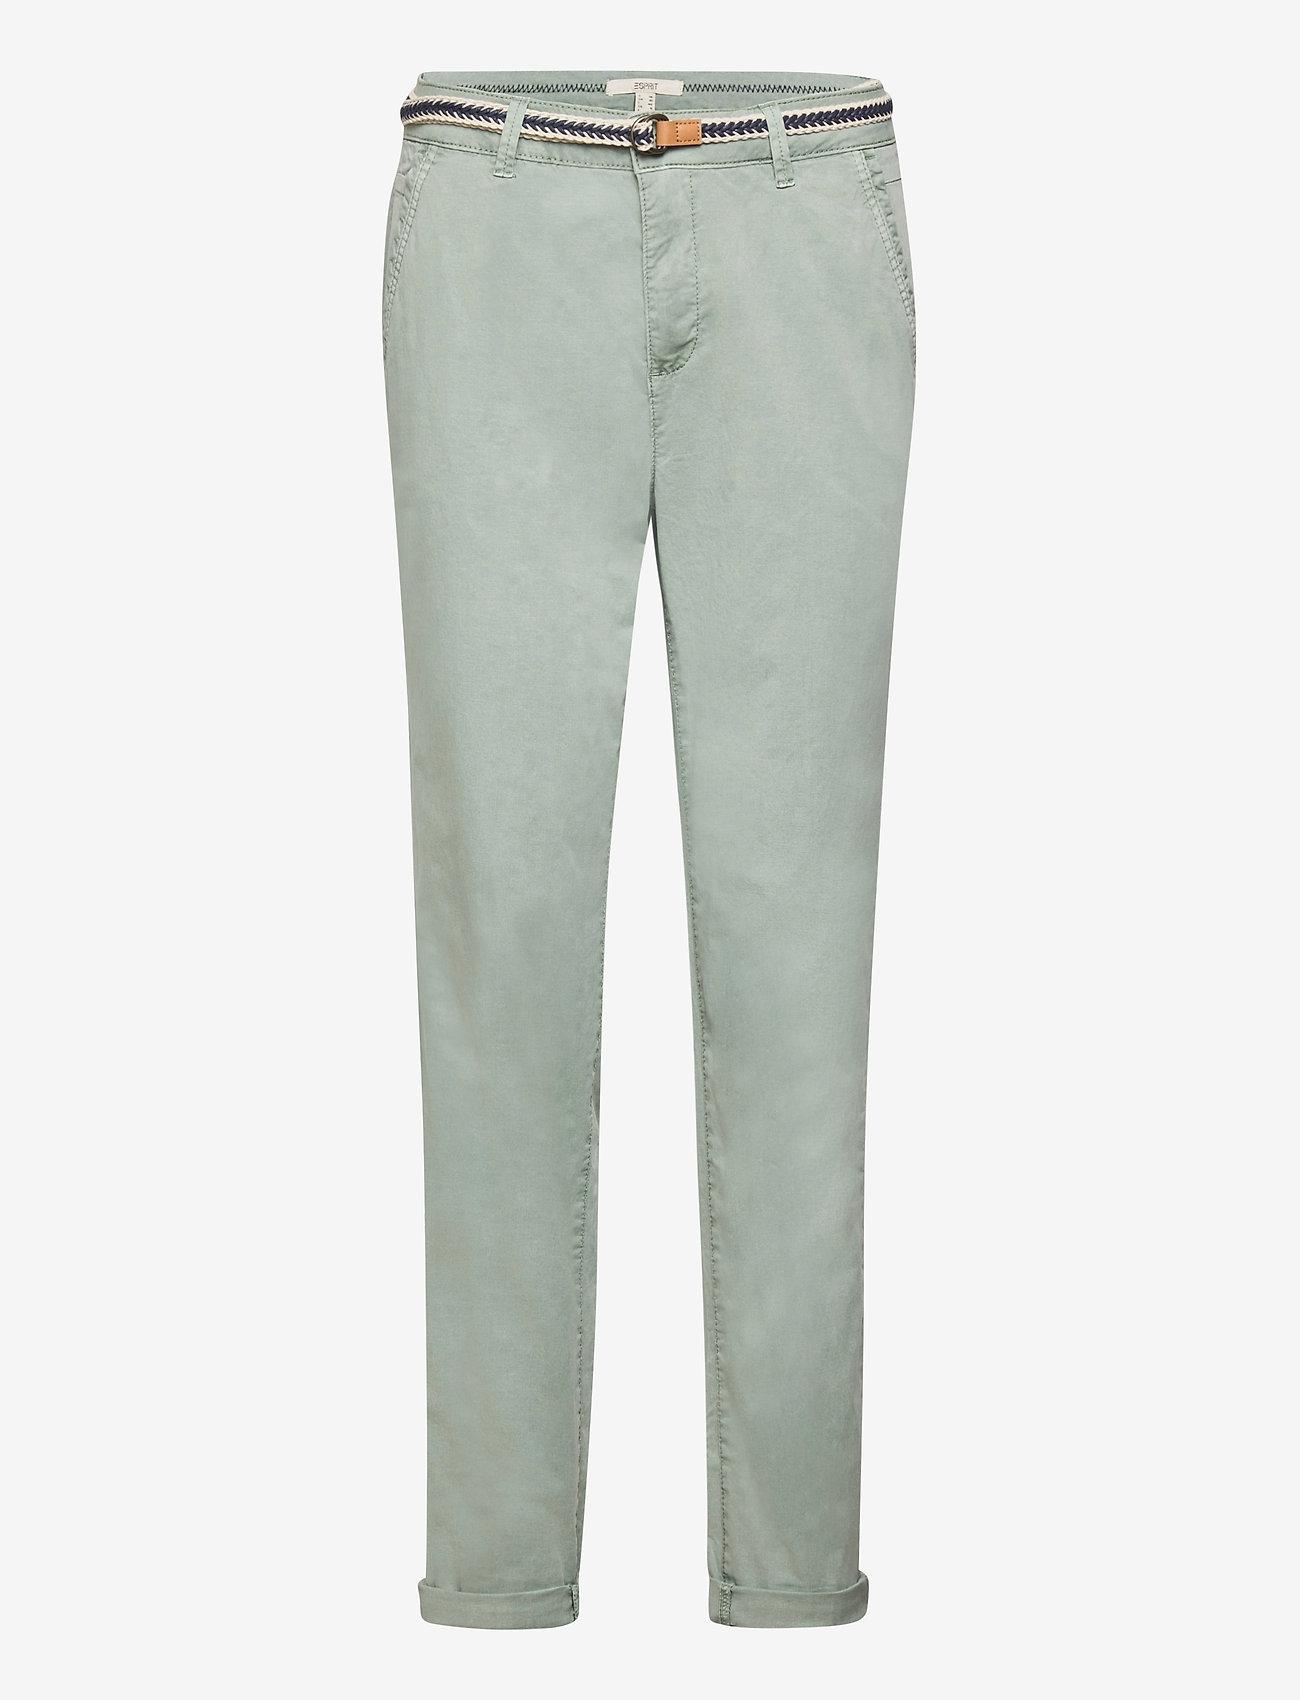 Esprit Casual - Pants woven - chinos - light khaki - 0